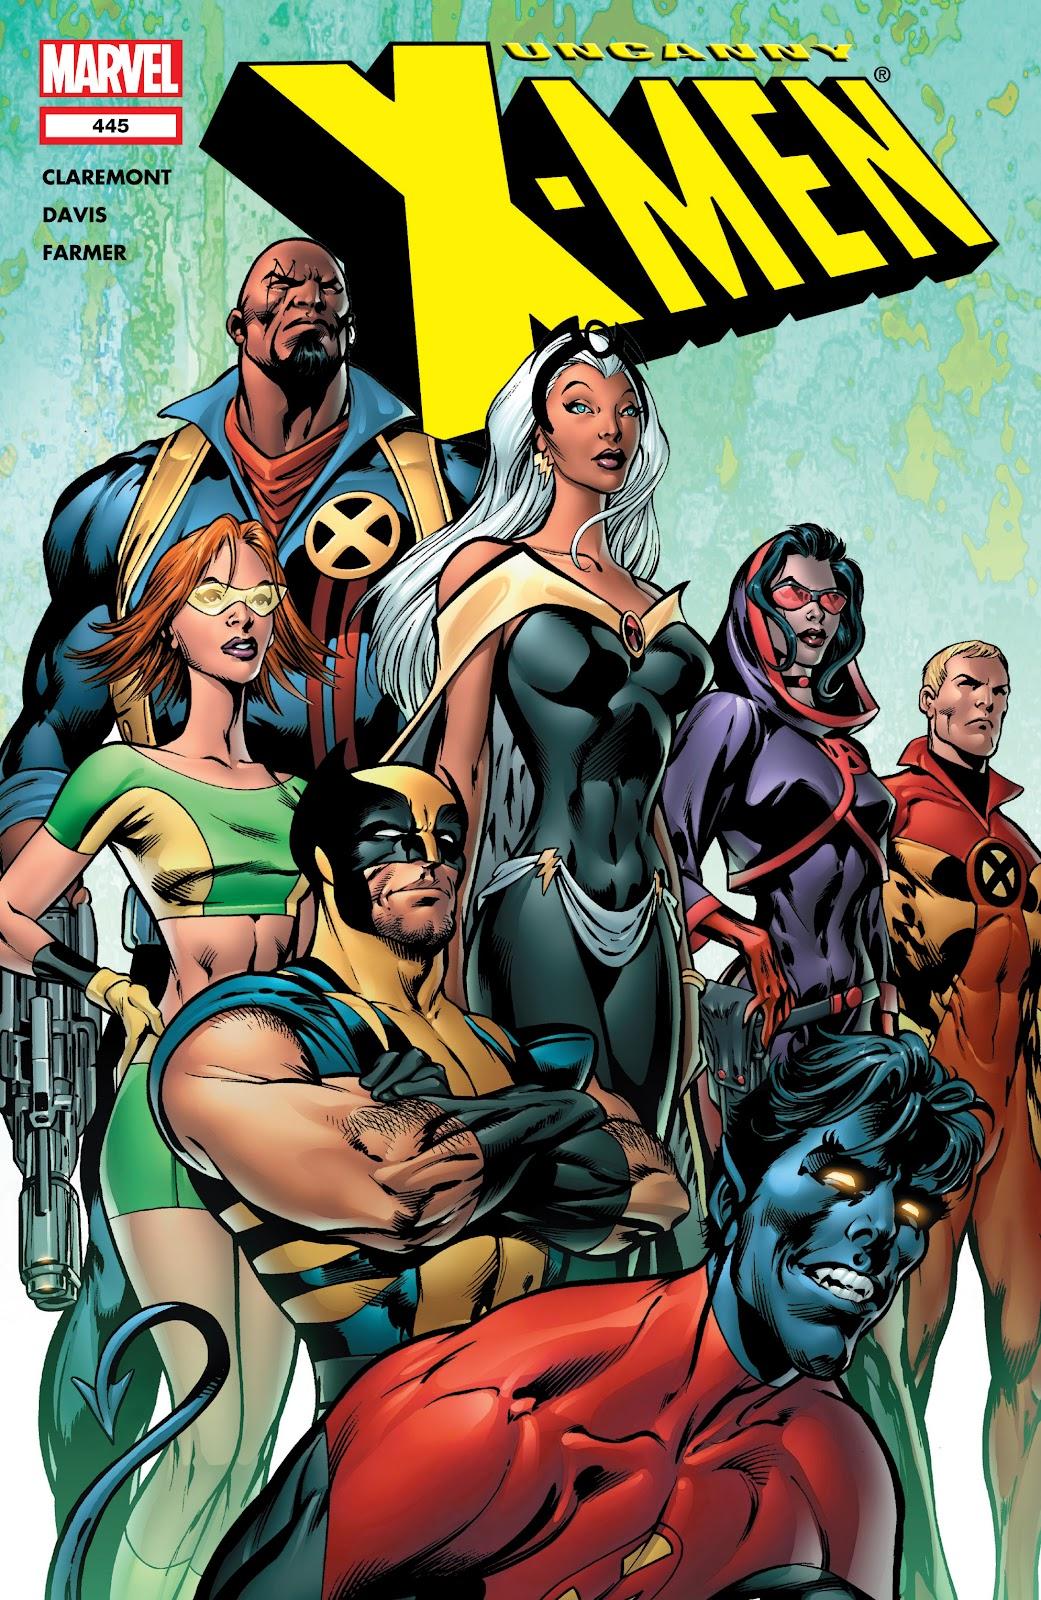 Uncanny X-Men (1963) issue 445 - Page 1